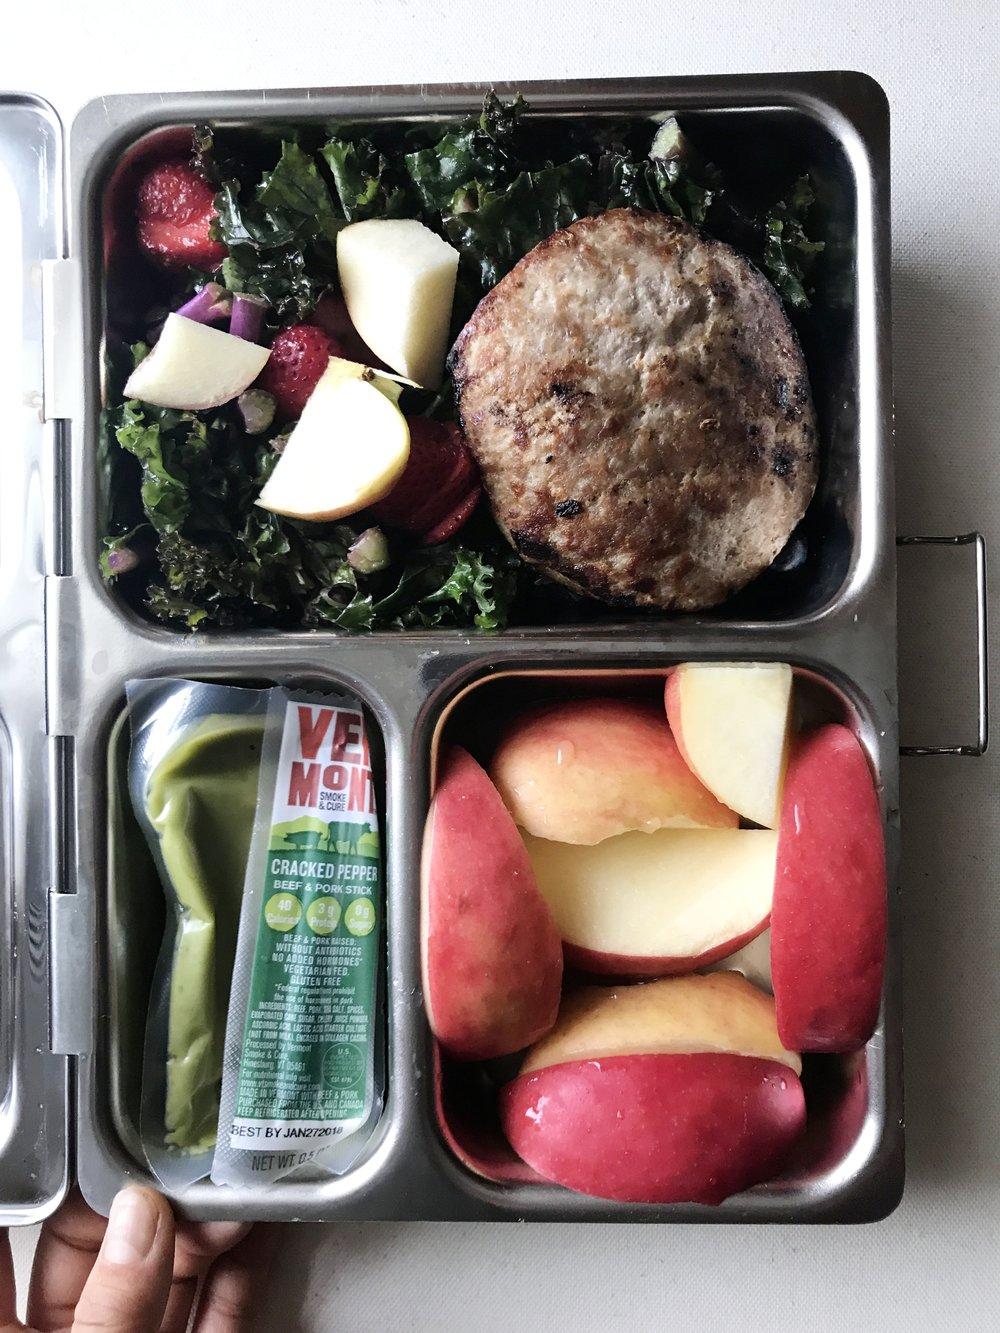 Kale with fruit, defrosted Trader Joe's turkey burger, Trader Joe's guac packet,  VT Smoke mini meat stick , sliced apple